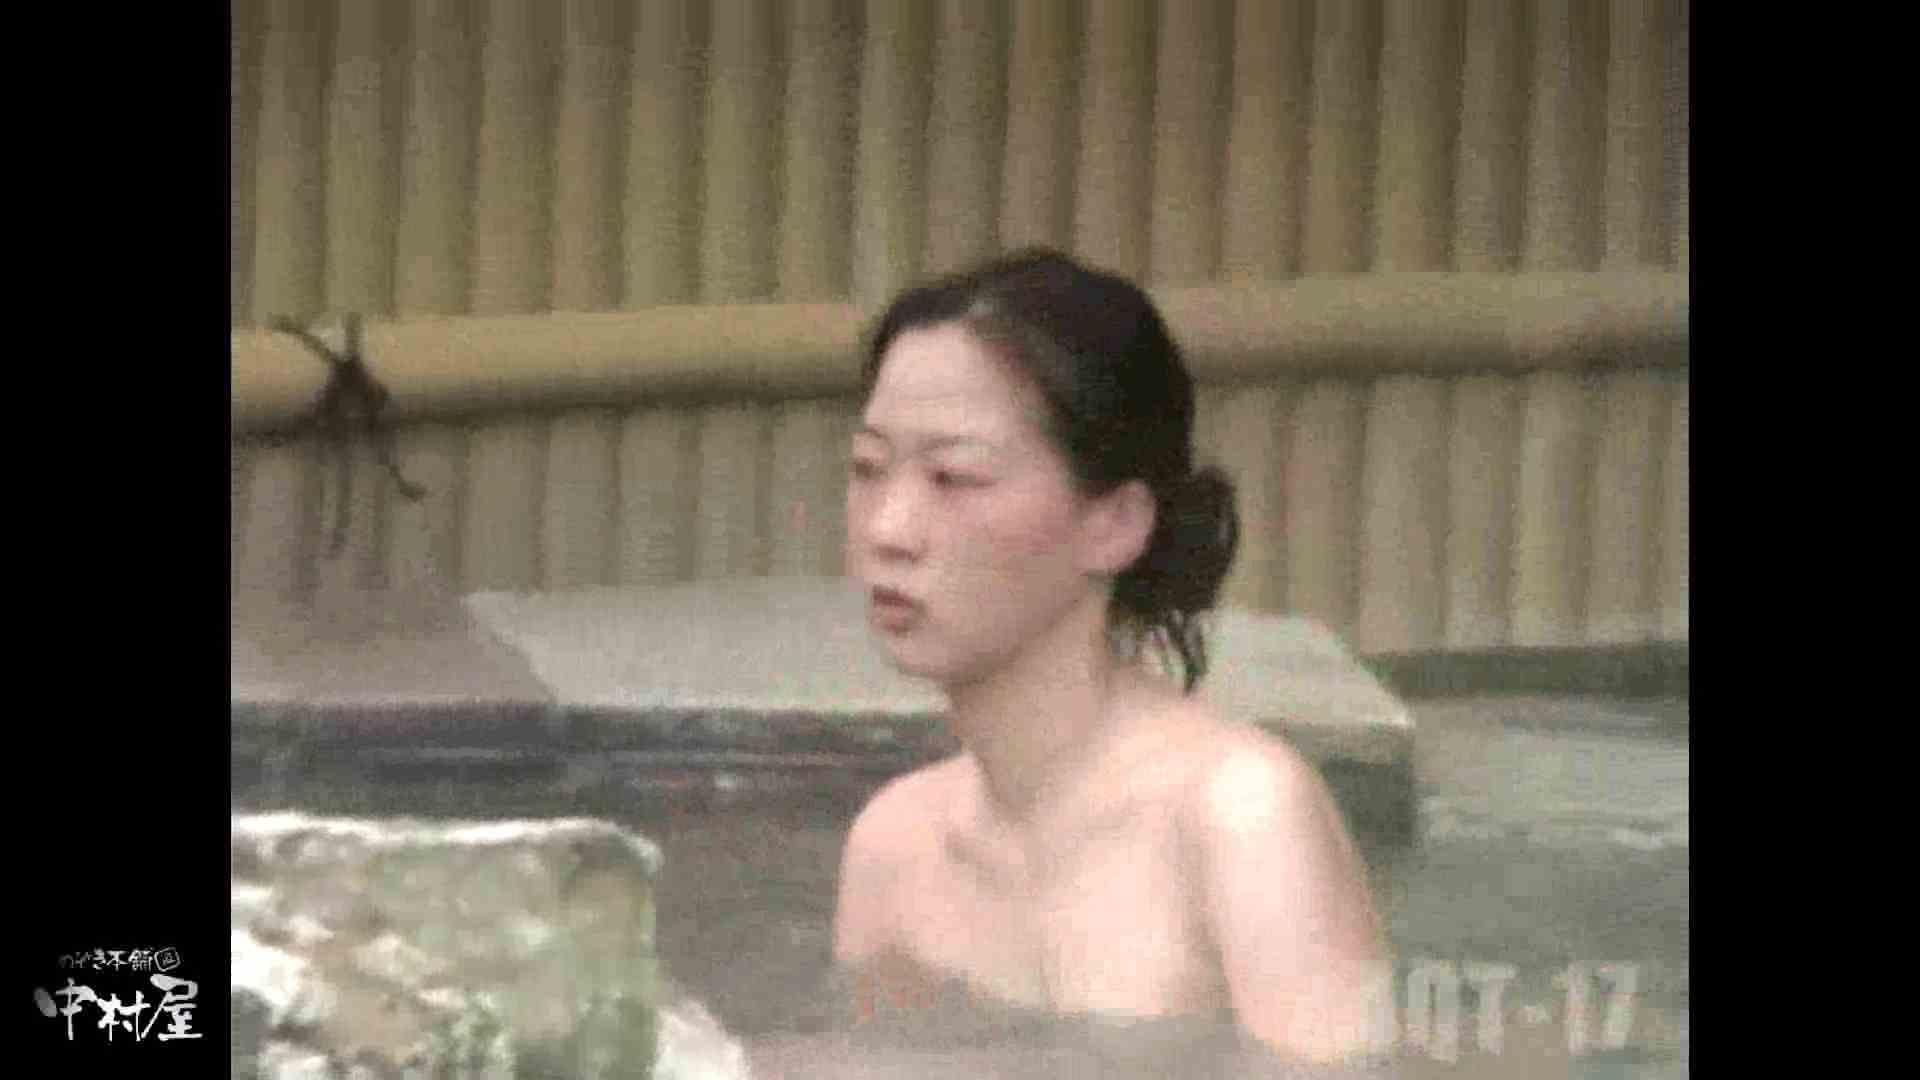 Aquaな露天風呂Vol.881潜入盗撮露天風呂十七判湯 其の一 盗撮特集   露天  68画像 4